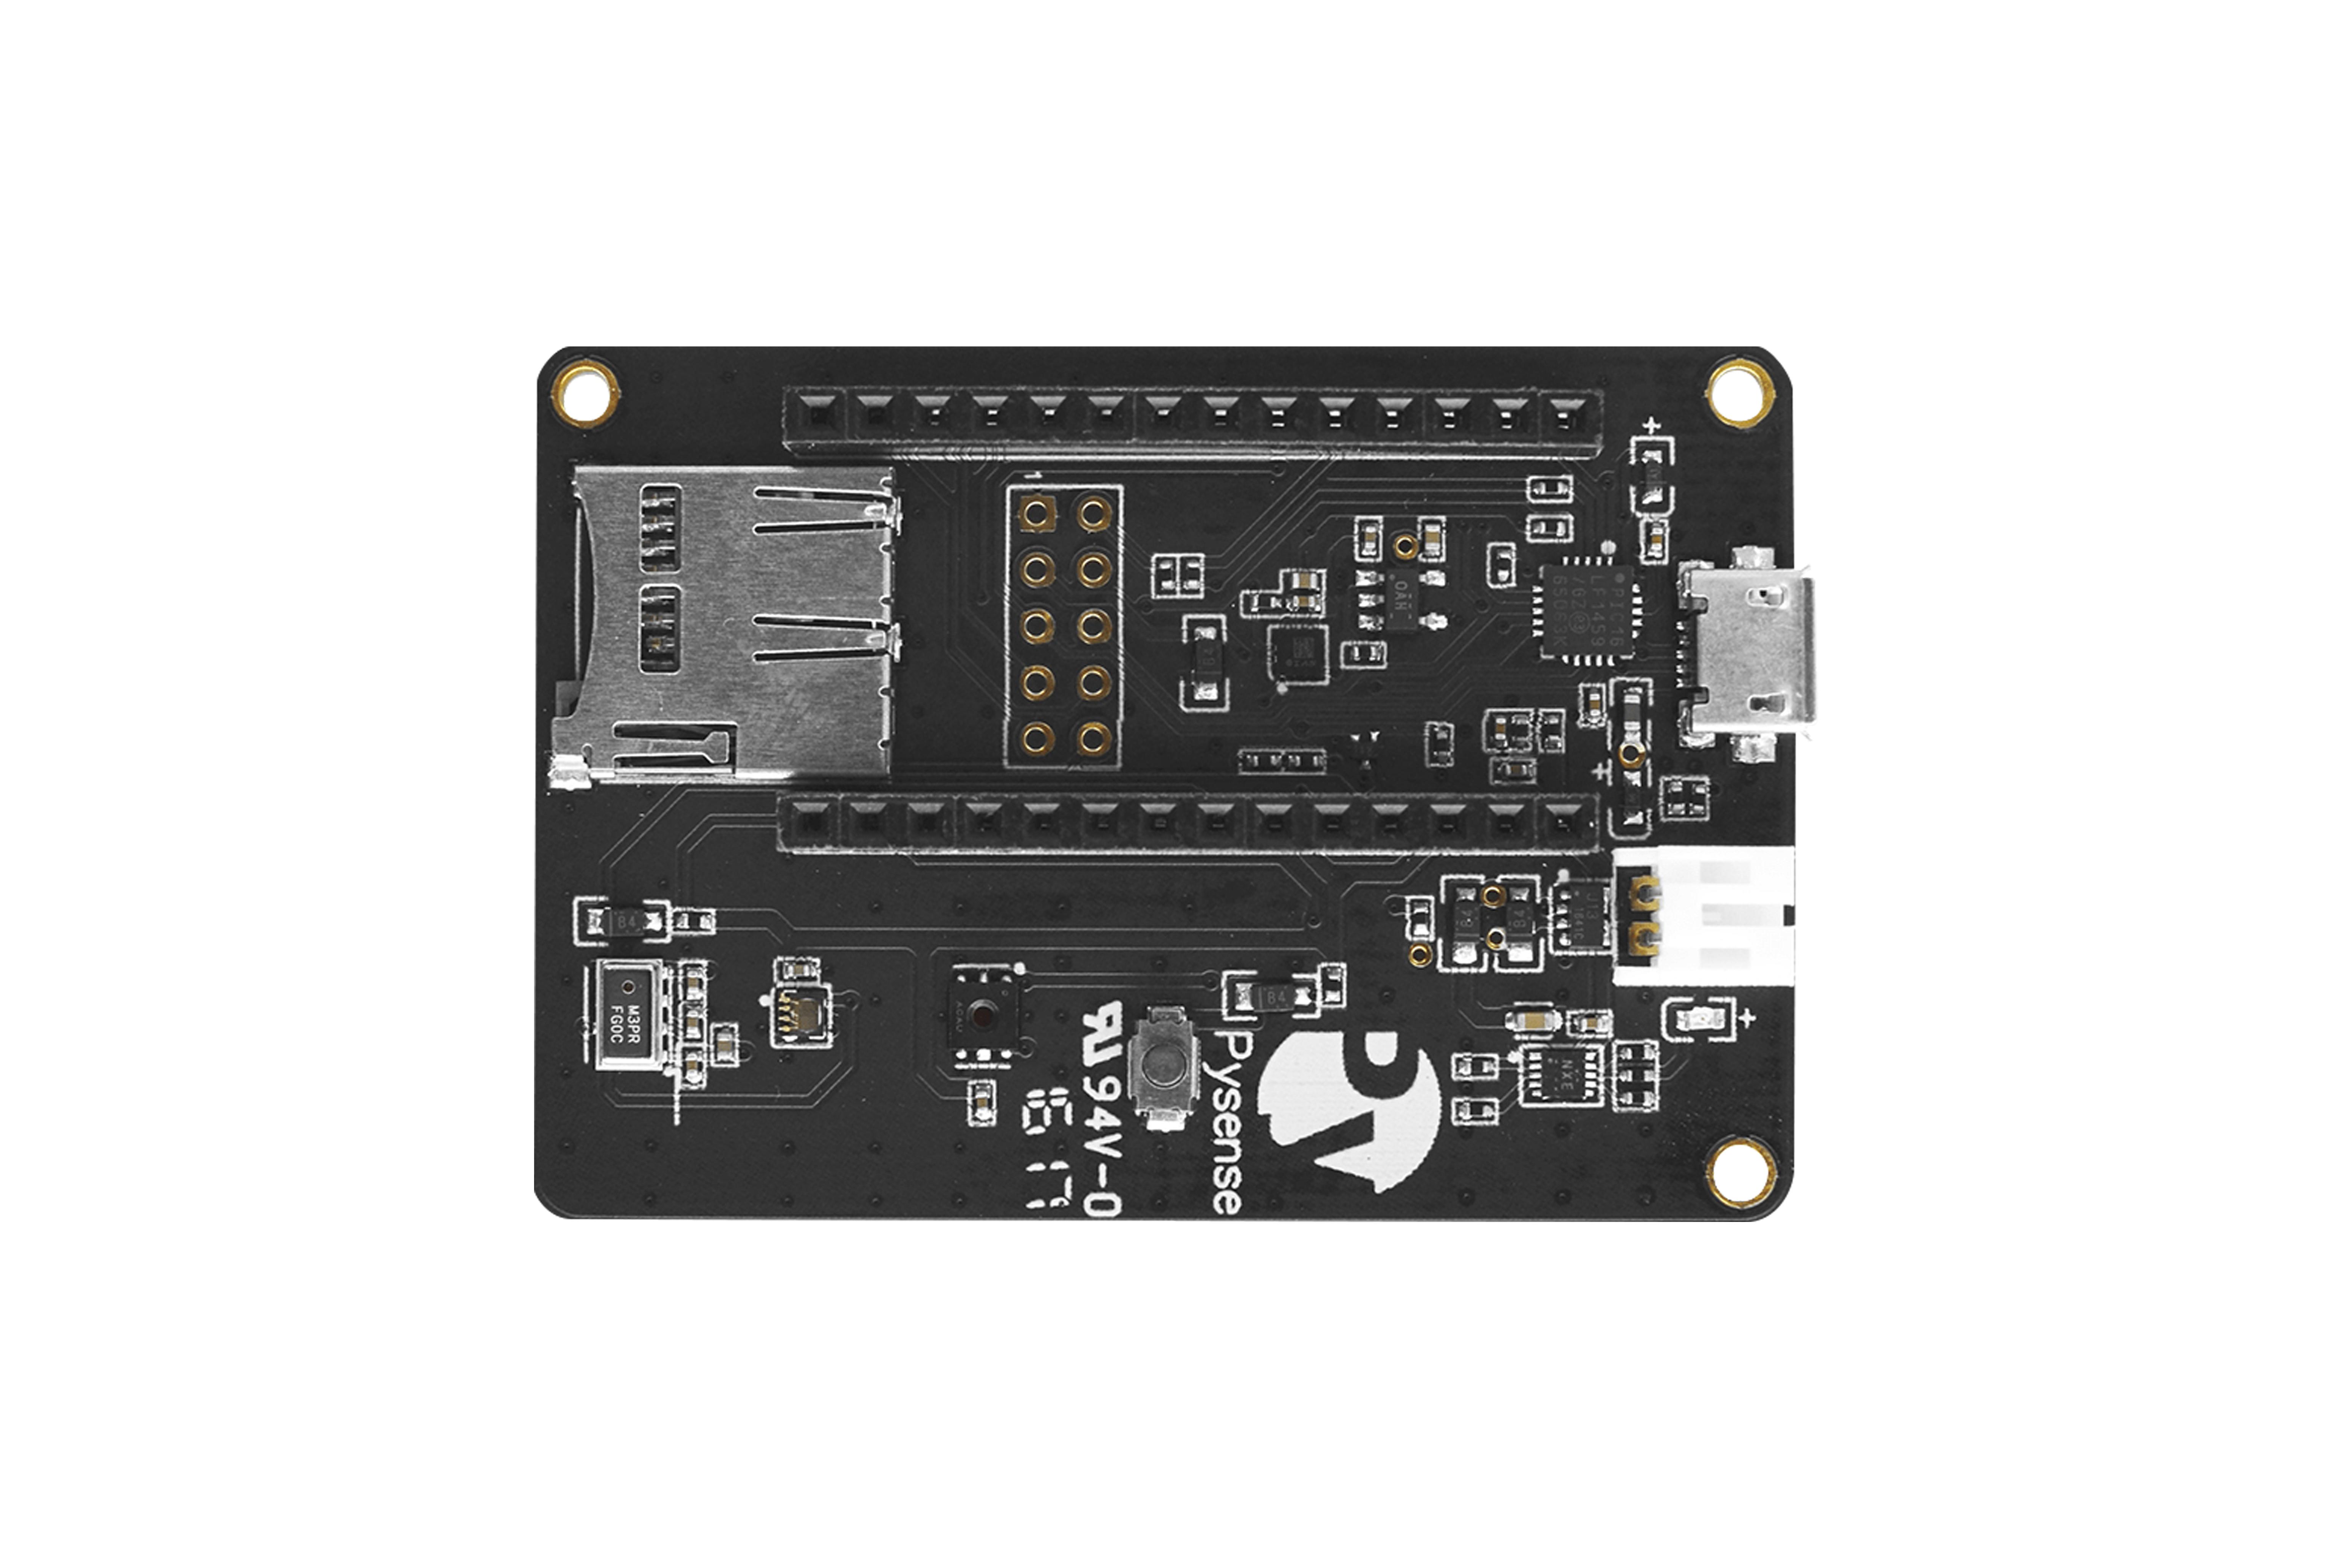 Pysense - Shield sensore perPycom